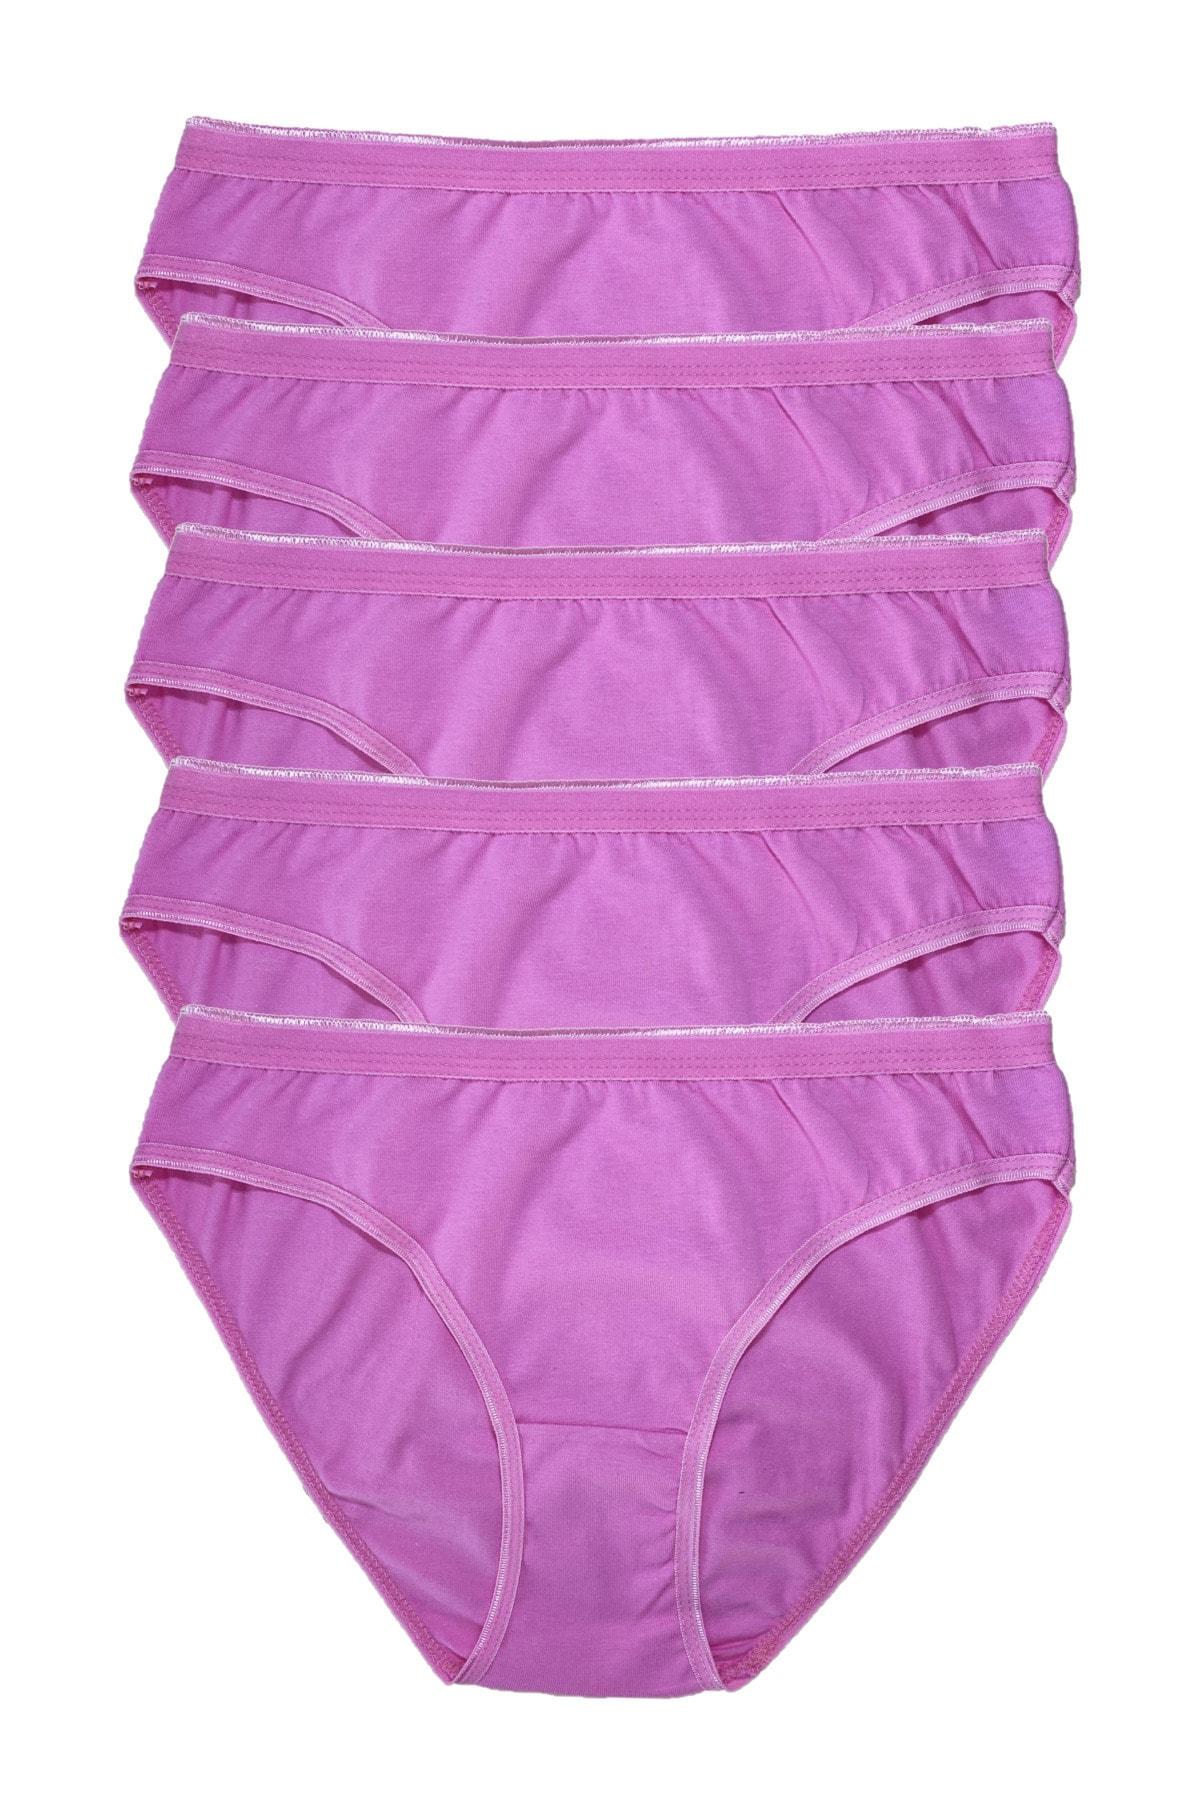 Tutku Kadın Pembe Penye Bikini 5li Külot 1